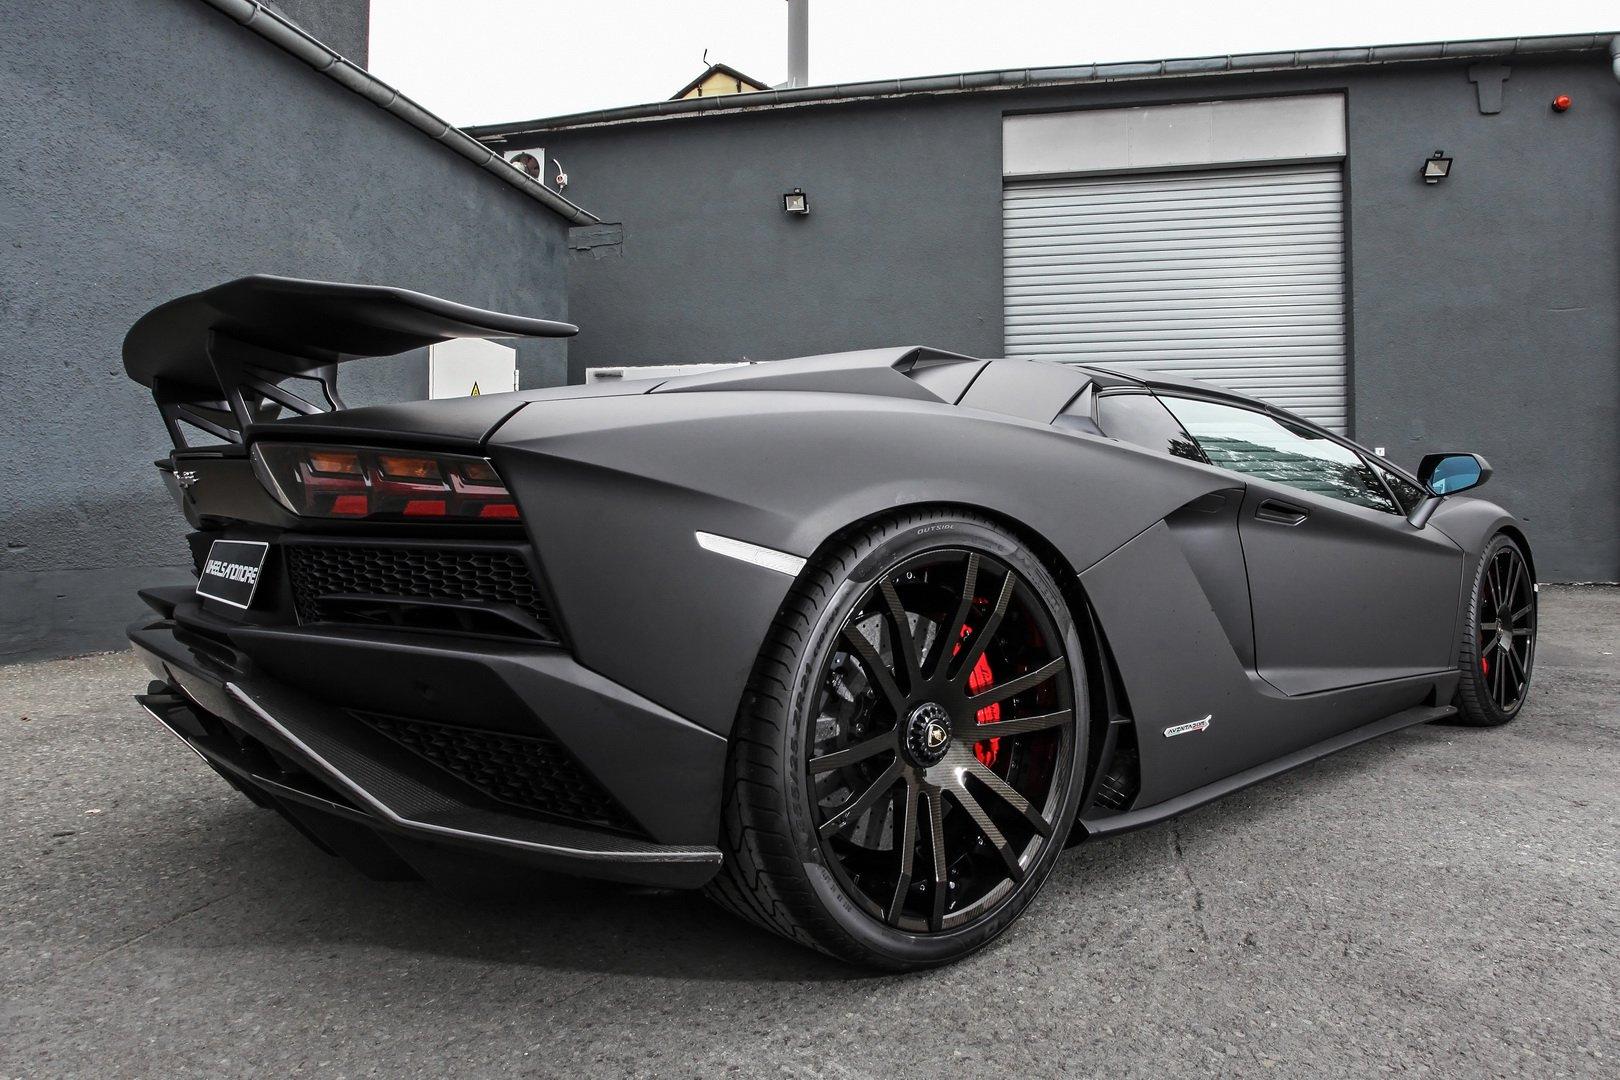 Lamborghini Aventador S Roadster by Wheelsandmore (6)